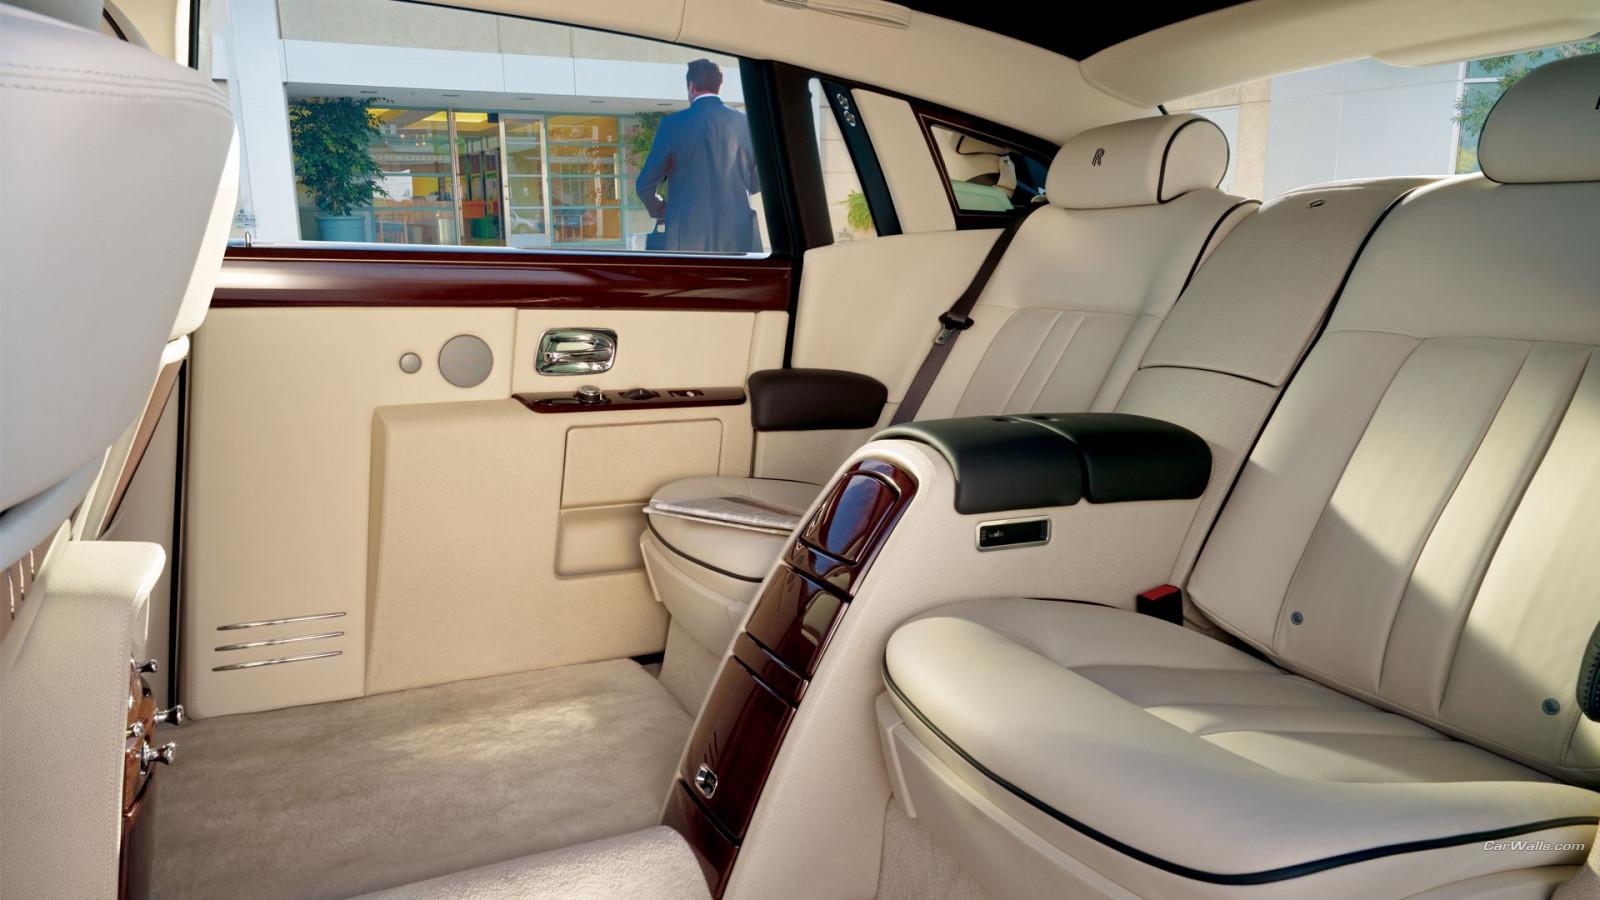 Wallpaper Car Interior Sedan Rolls Royce Phantom 1920x1080 Px Land Vehicle Automotive Exterior Automobile Make Ecosystem Luxury Vehicle 1920x1080 Goodfon 693378 Hd Wallpapers Wallhere